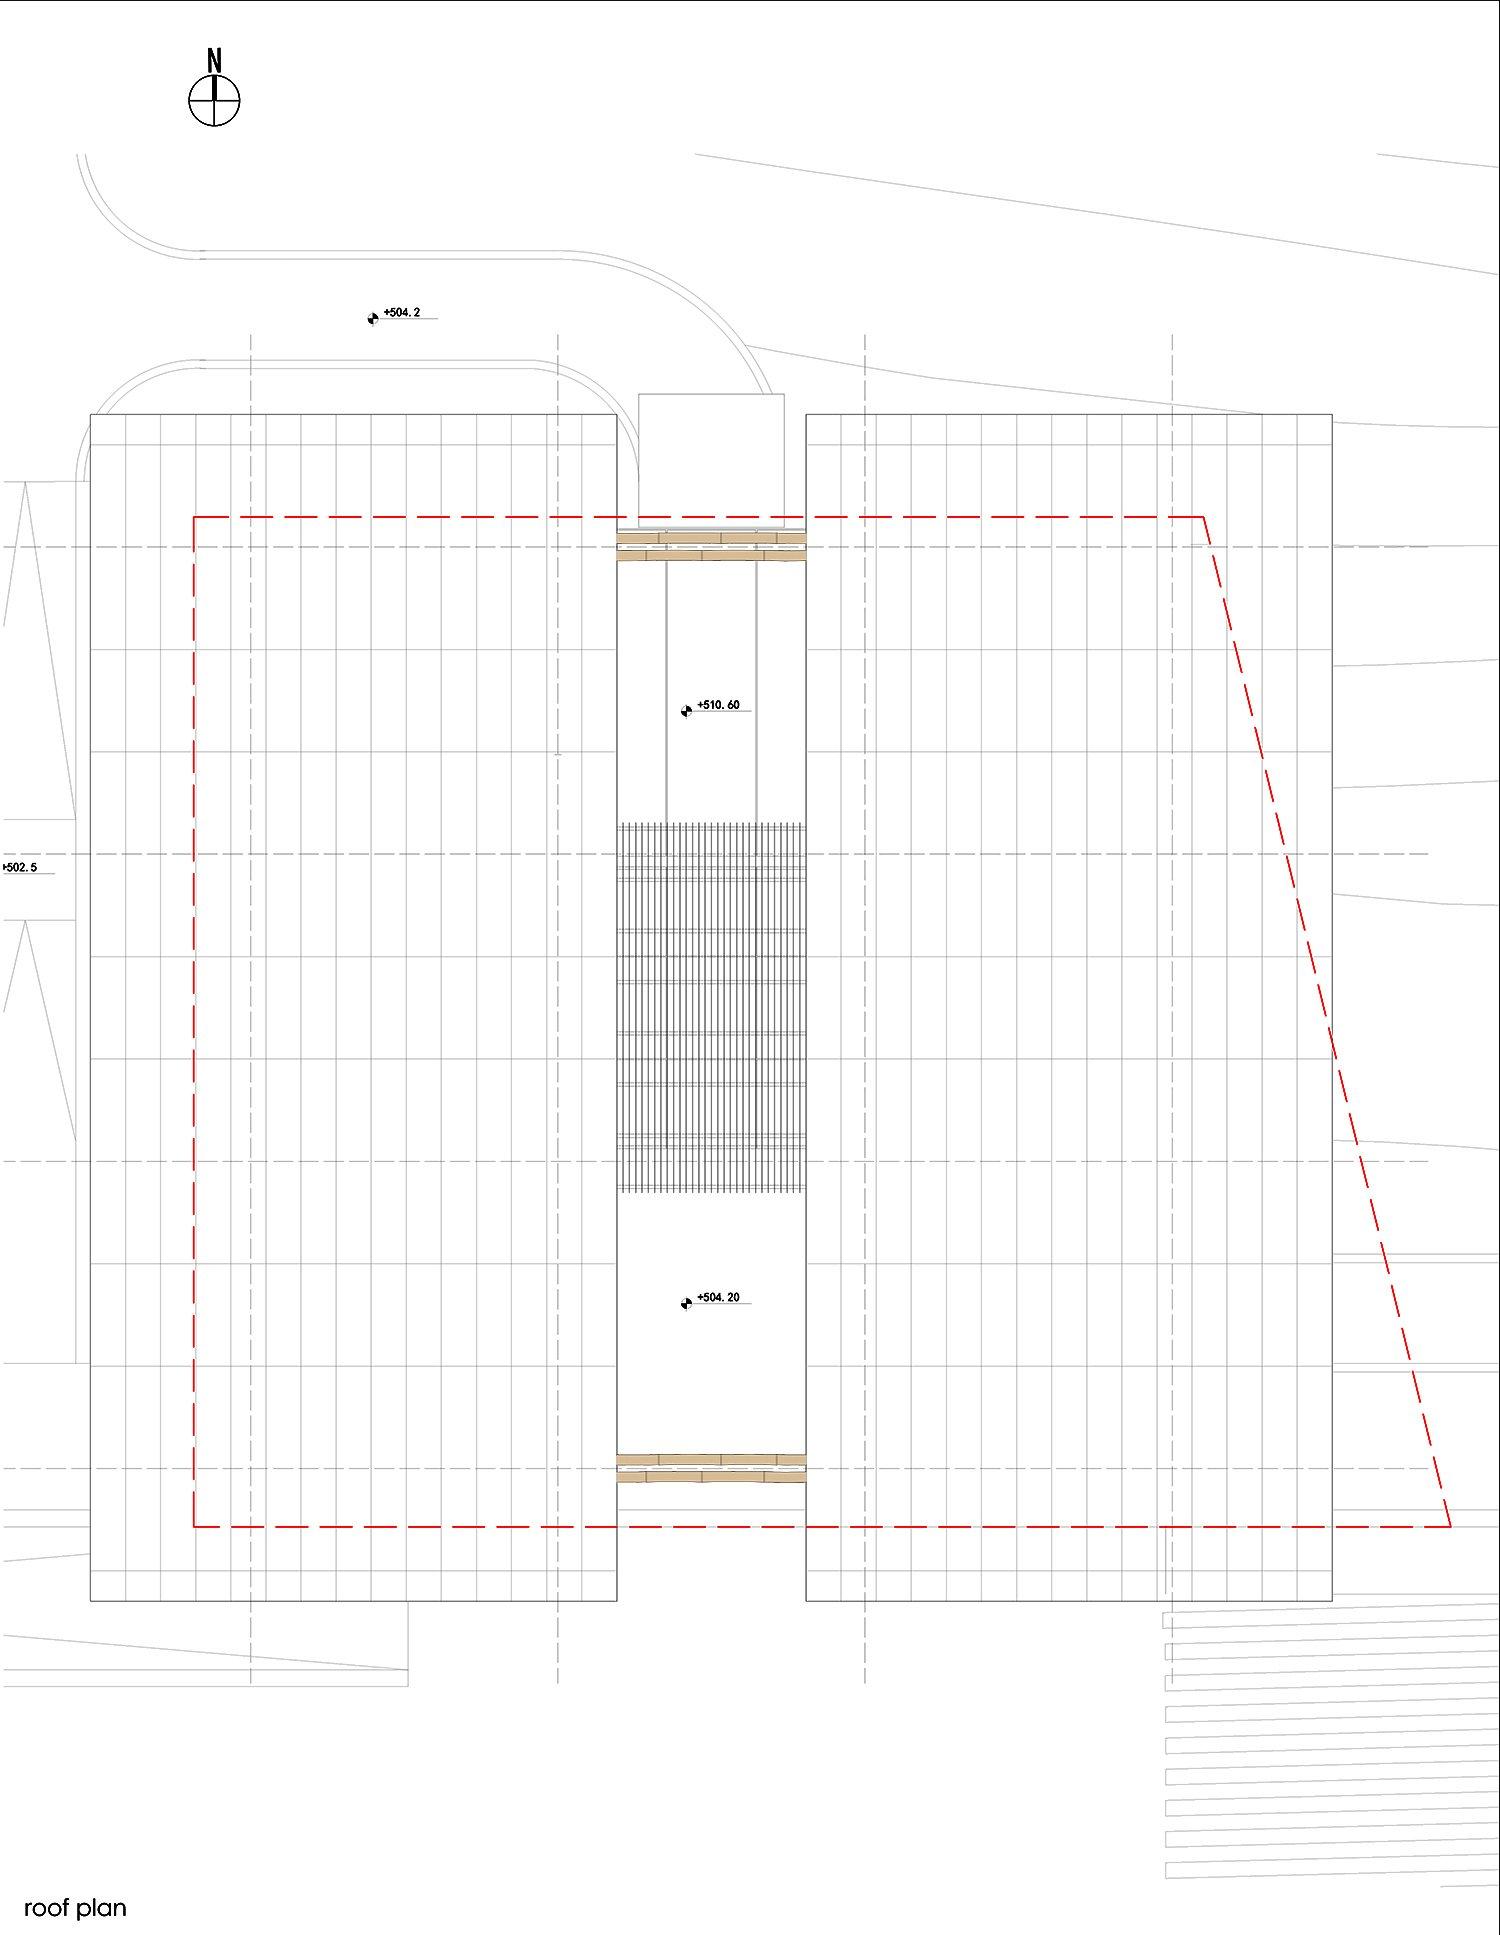 6. Roof plan }